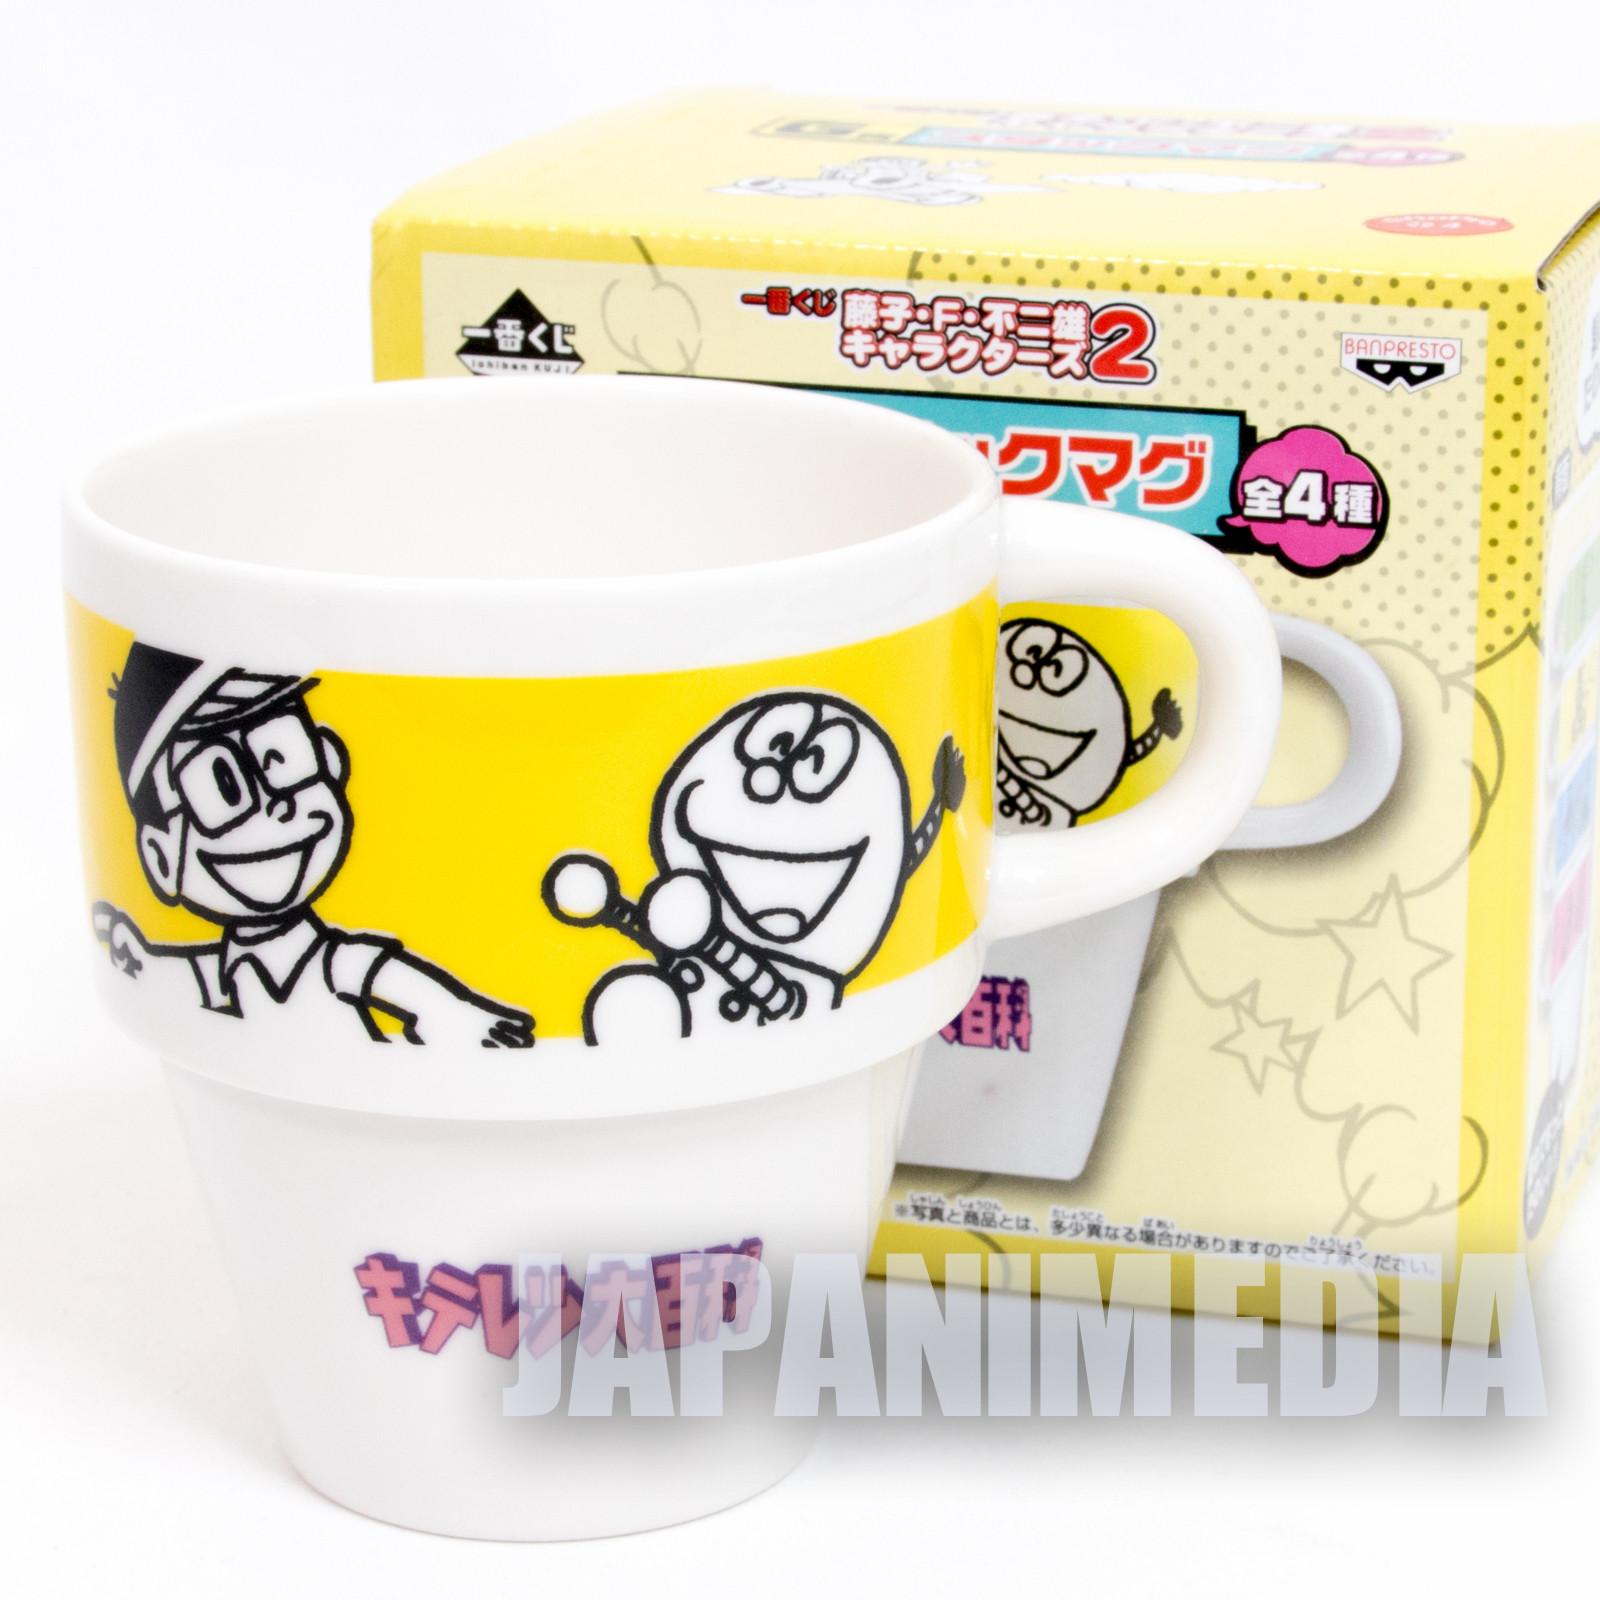 Fujiko F Fujio Characters Stacking Mug Cup Kiteretsu Daihyakka JAPAN ANIME MANGA